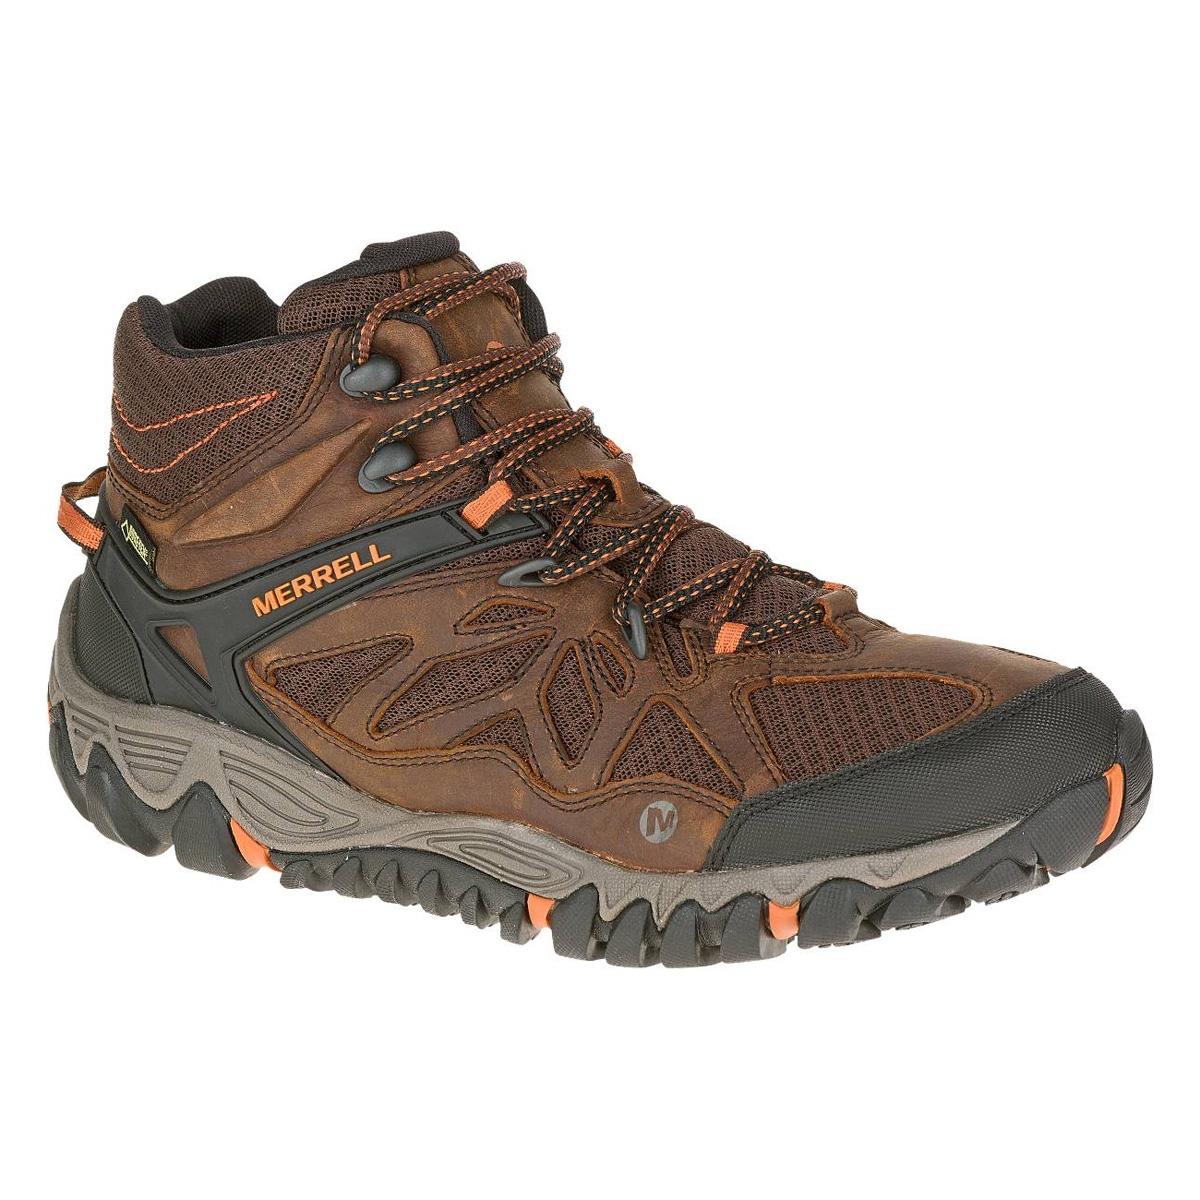 Merrell All Out Blaze Ventilator Gore-Tex Walking Shoes K22y8956